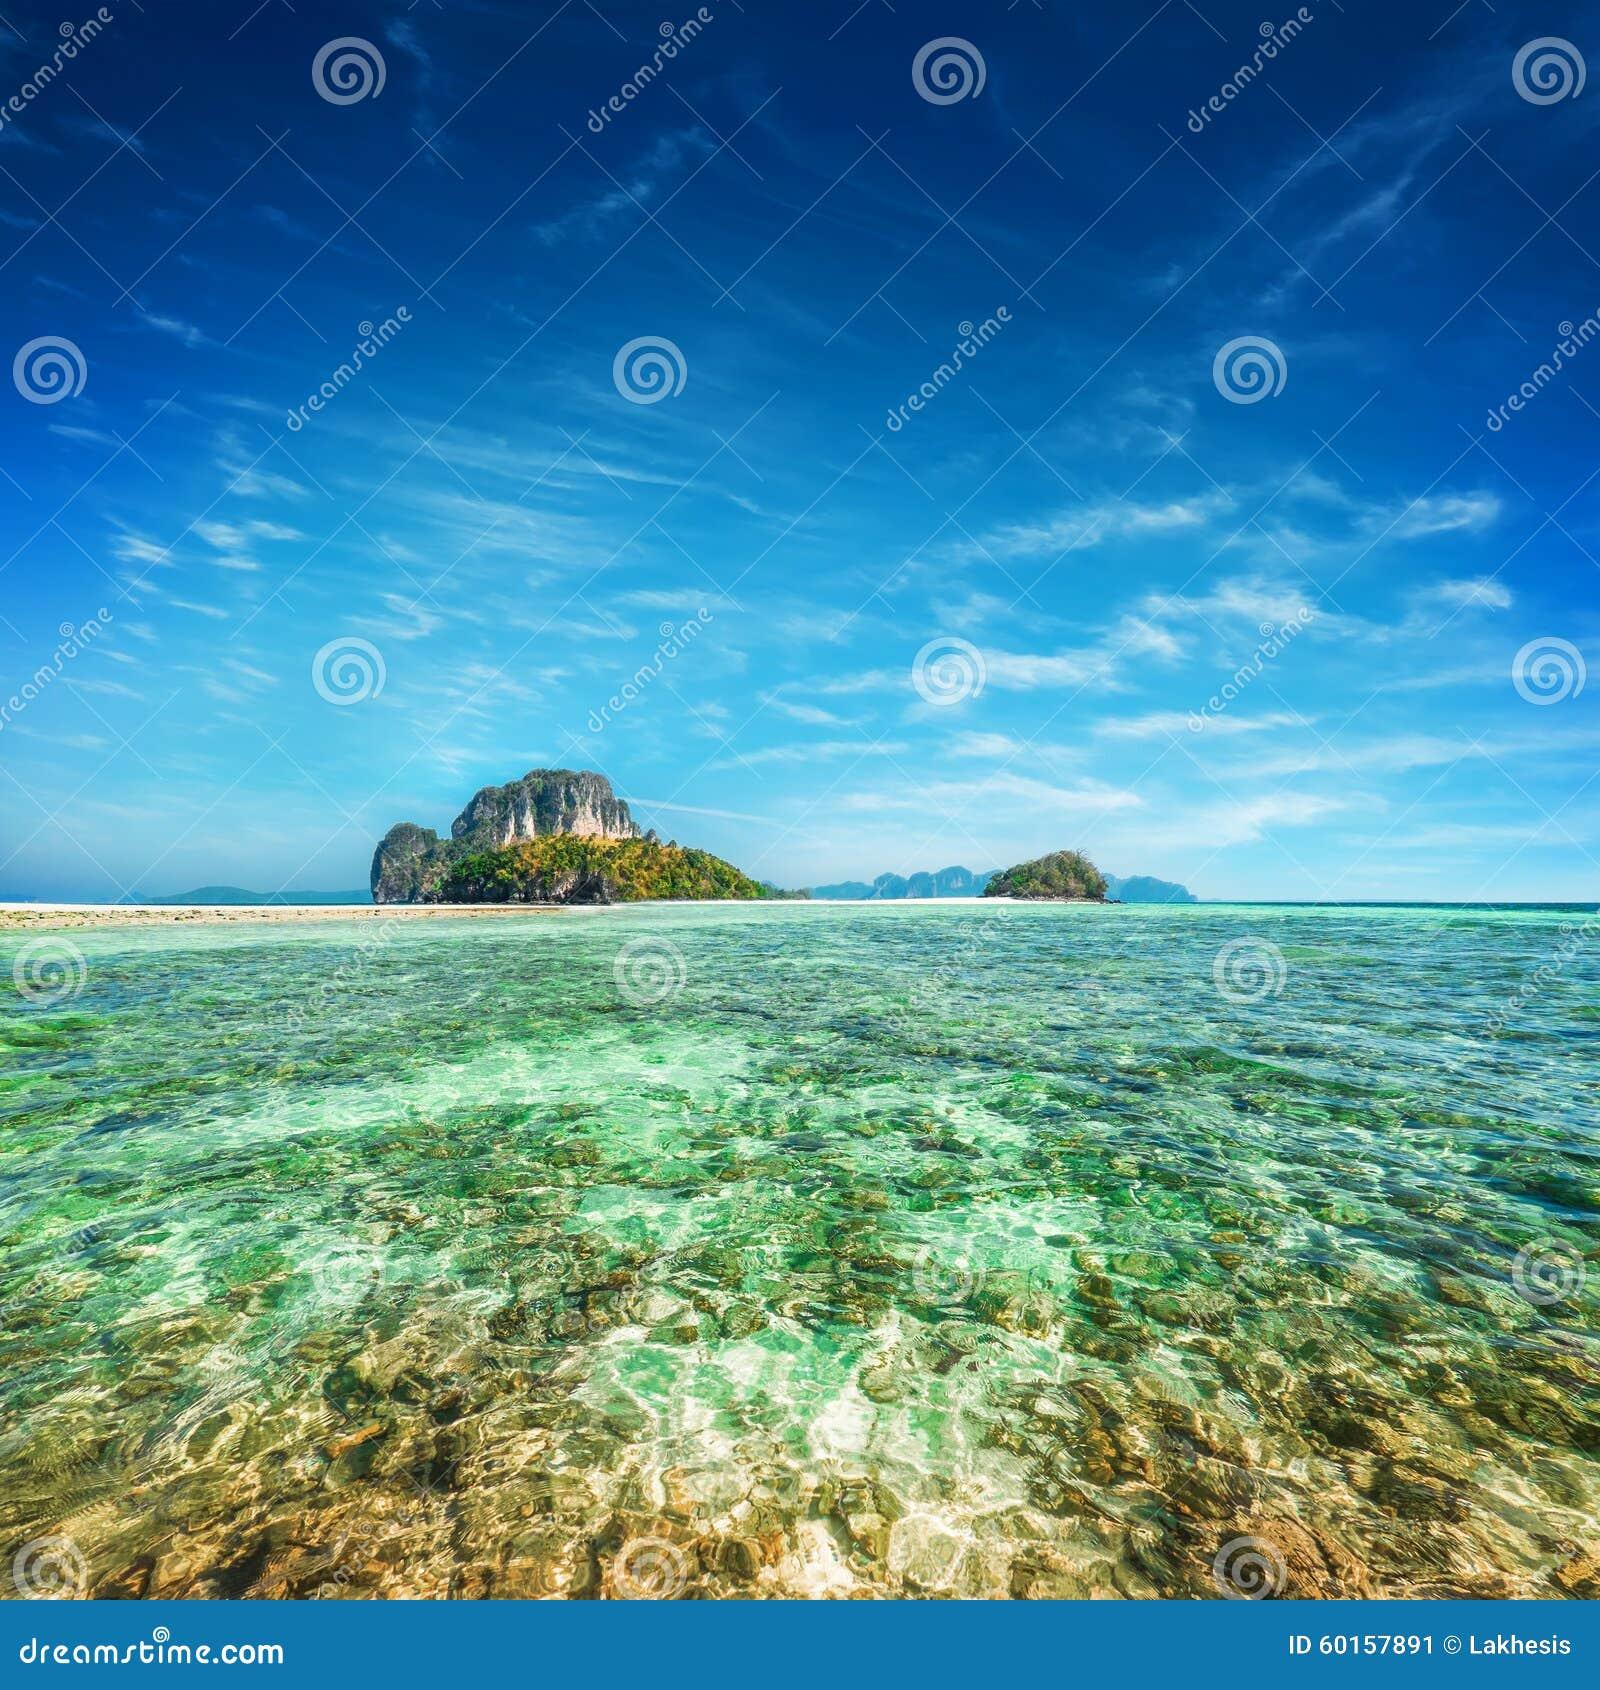 http://tup.66vod.net:888/2015/0974.jpg_与酸值tup海岛的热带海洋风景绿松石水的在蓝天下 泰国,甲米府, ao